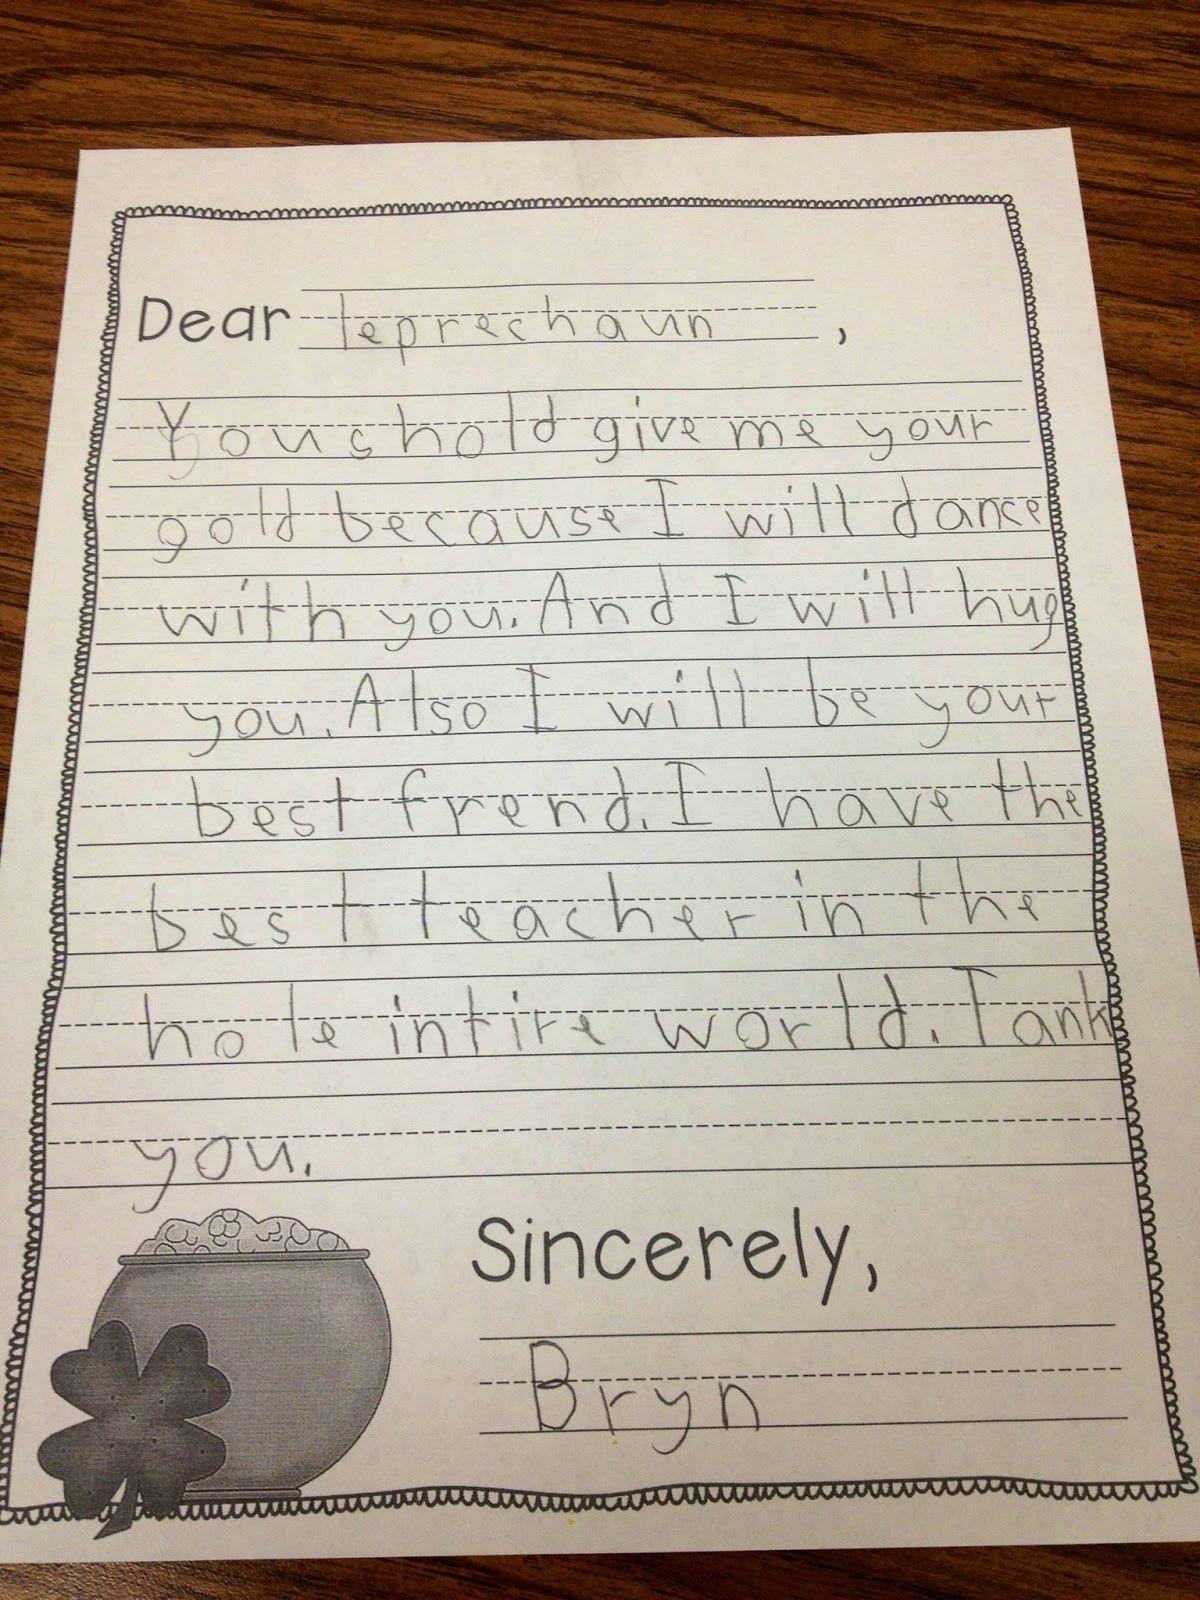 Letters To A Leprechaun Students Persuade A Leprechaun